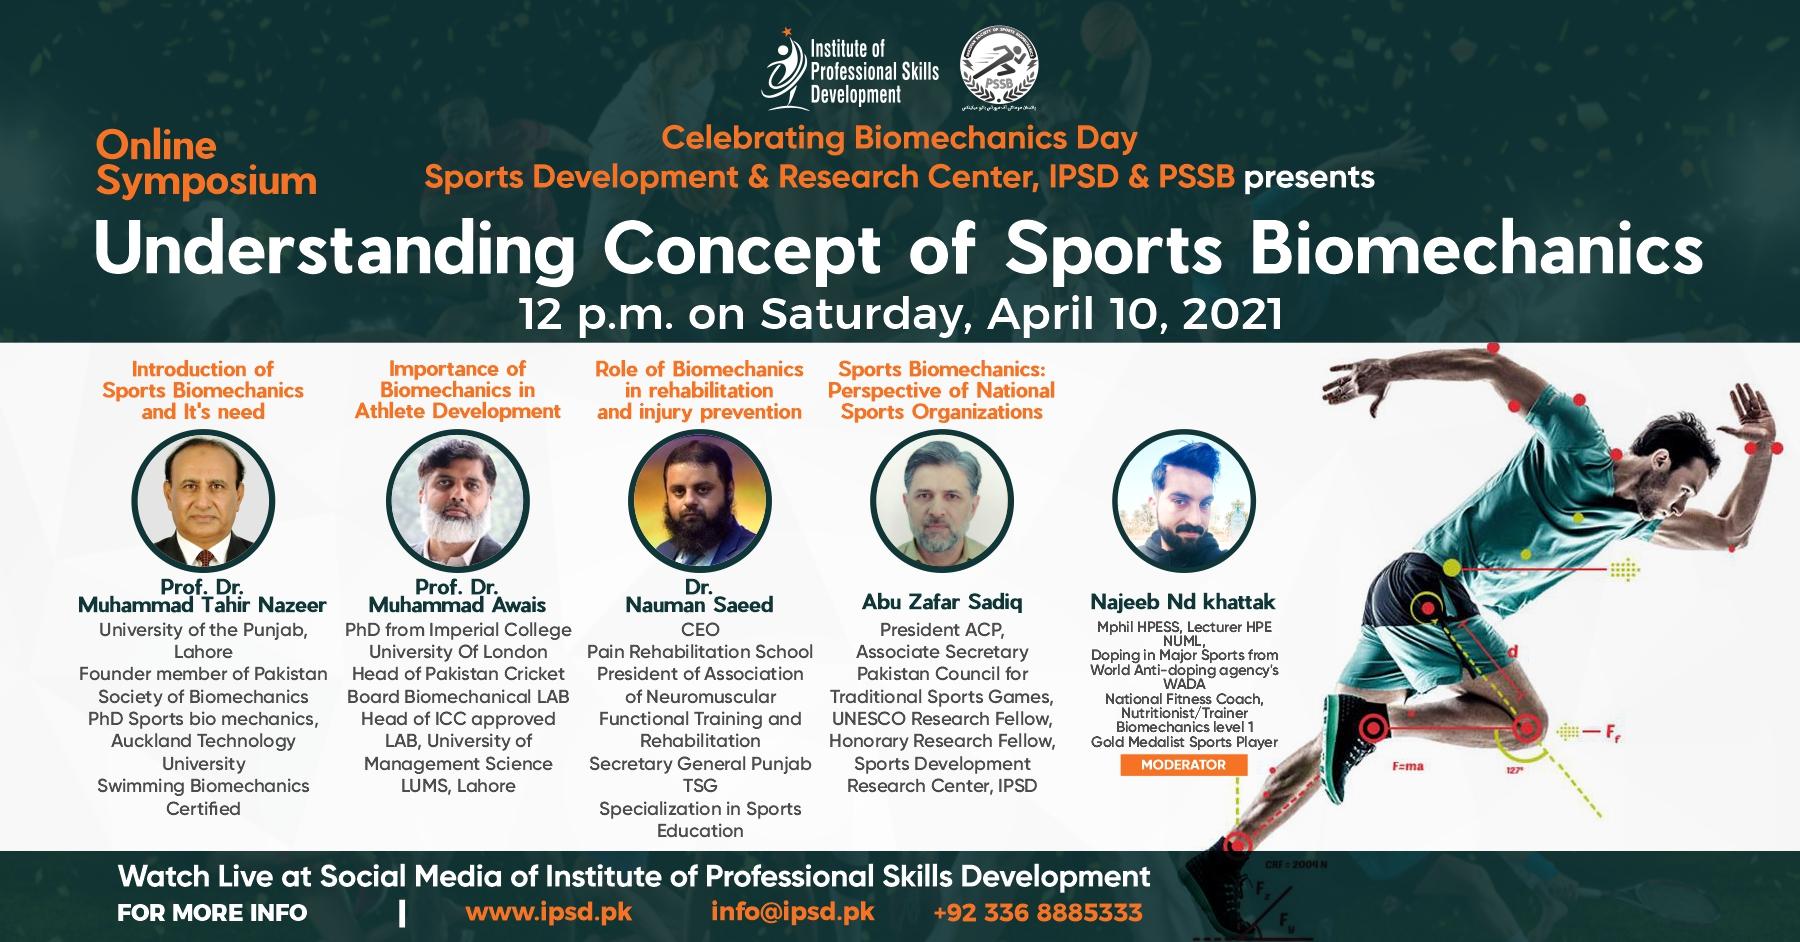 Online Symposium Understanding Concept of Sports Biomechanics